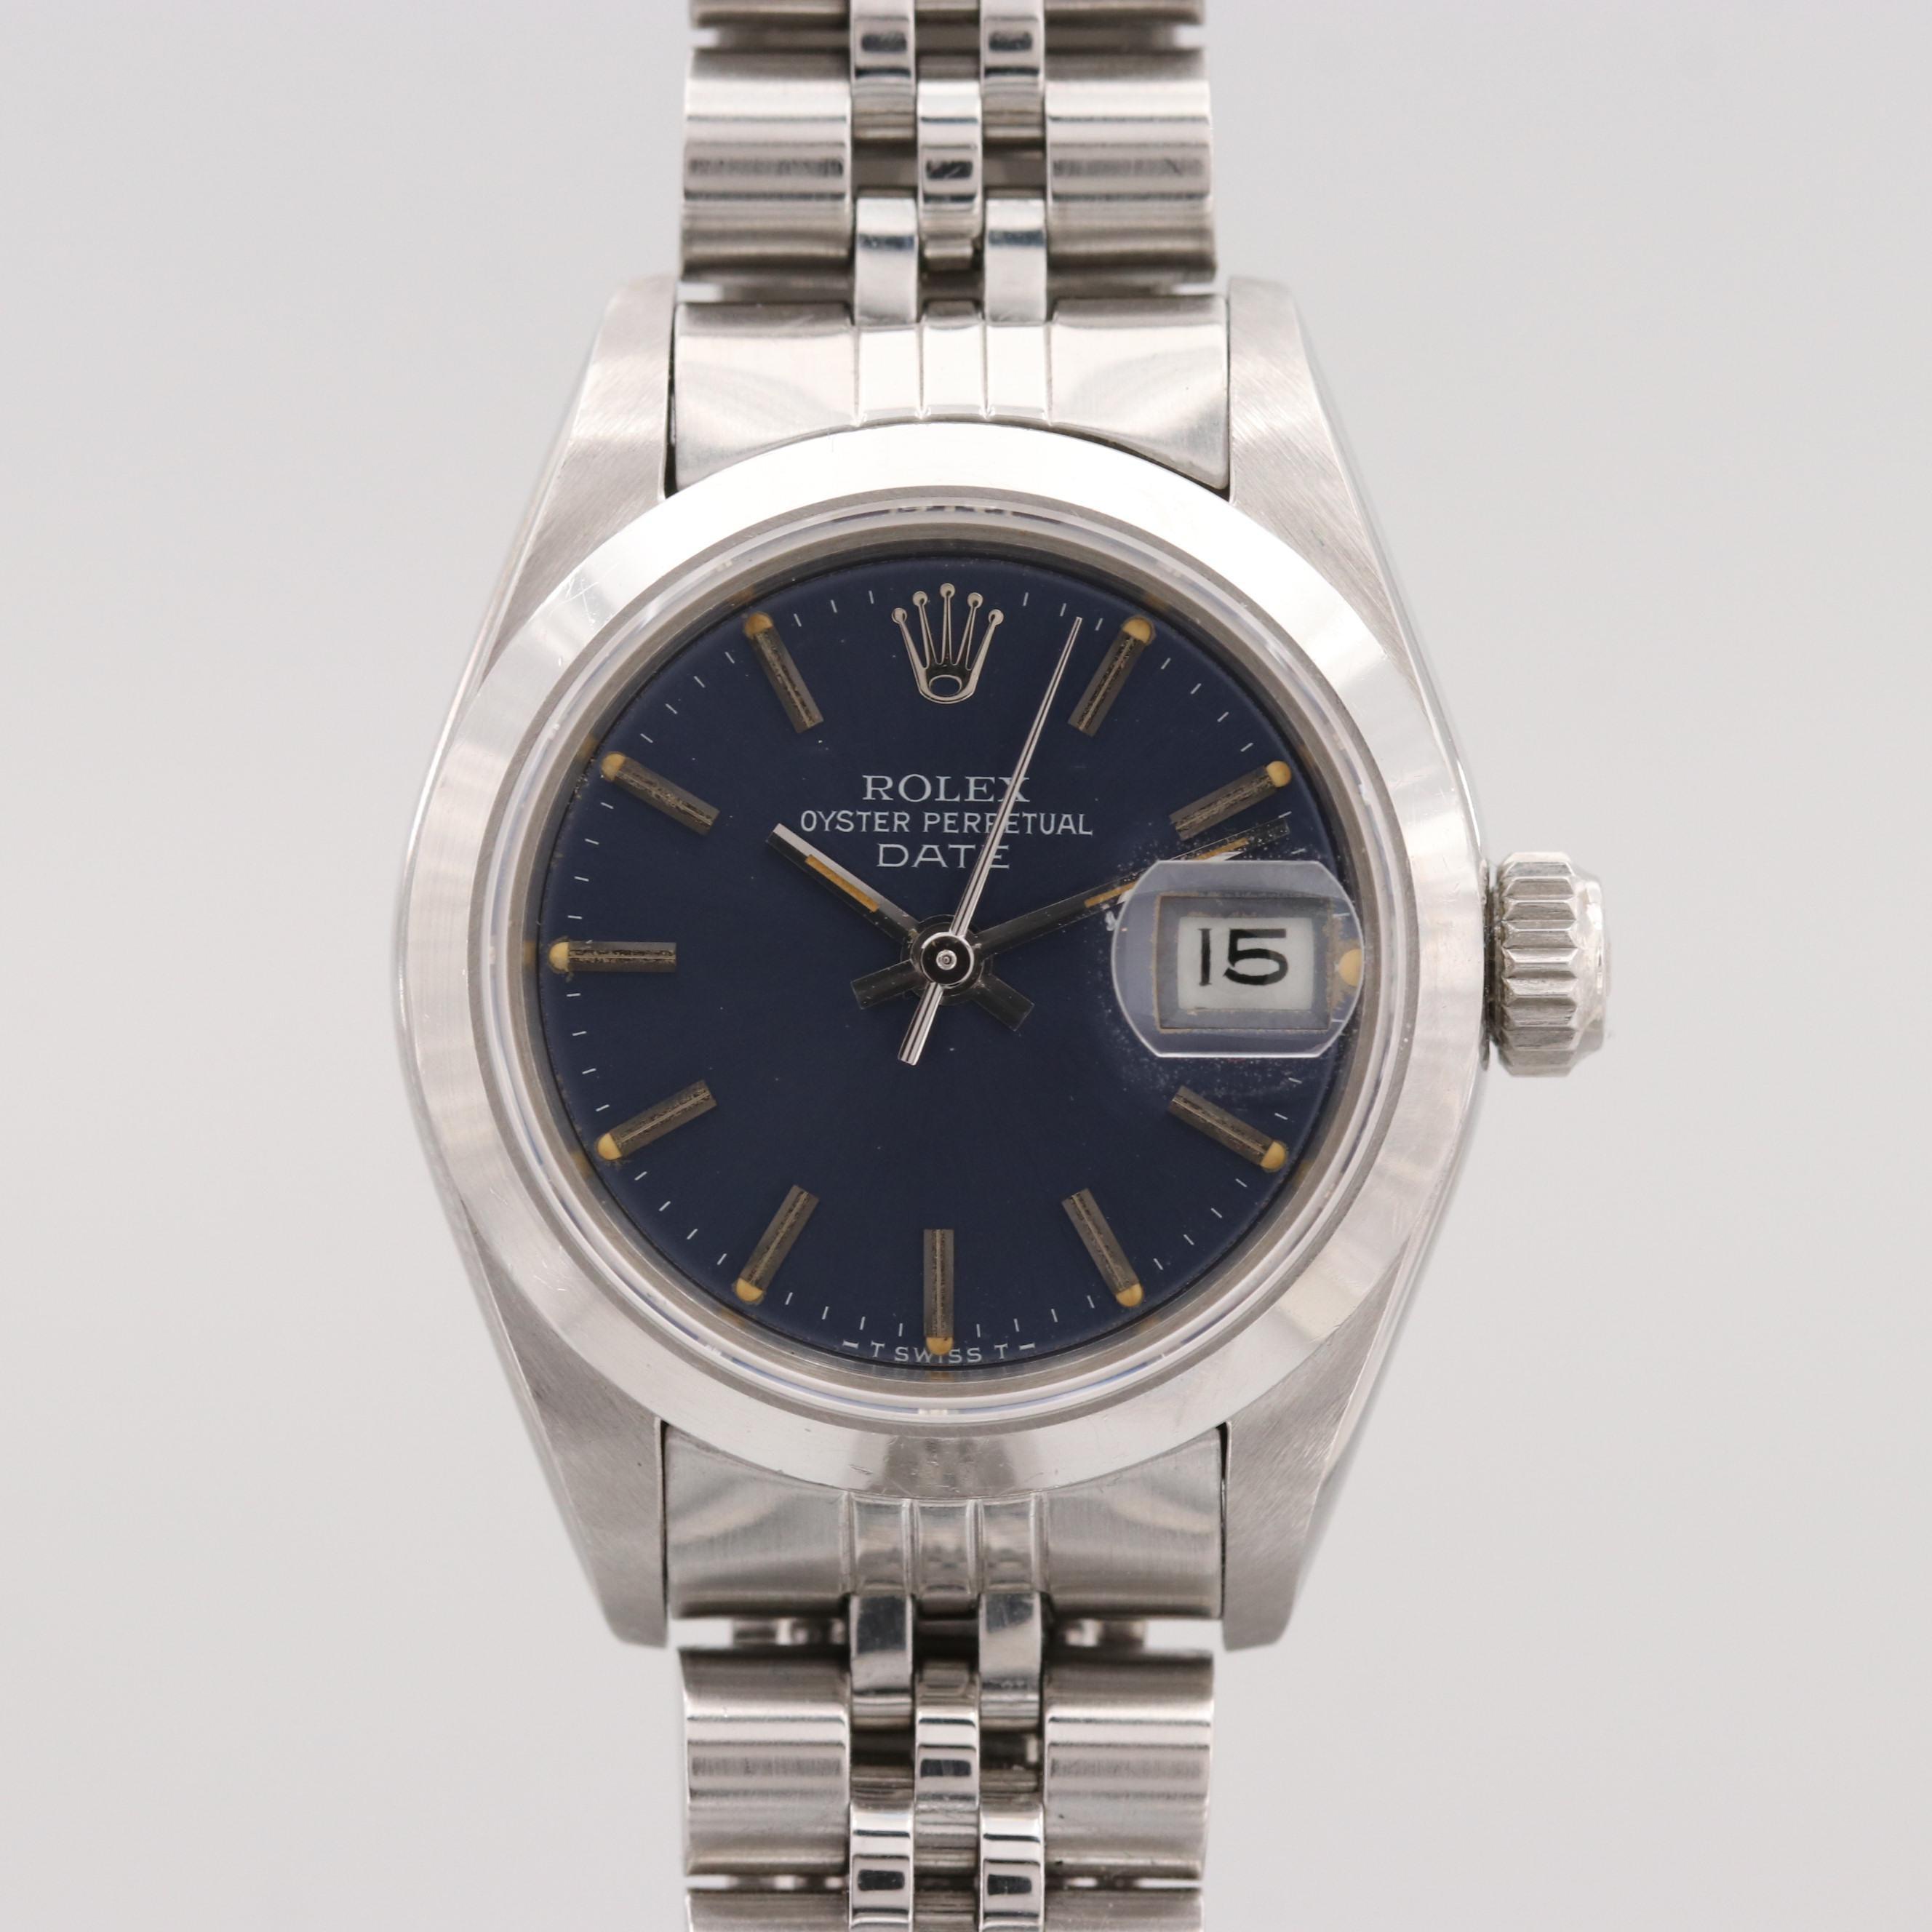 Rolex Date Stainless Steel Wristwatch, 1984